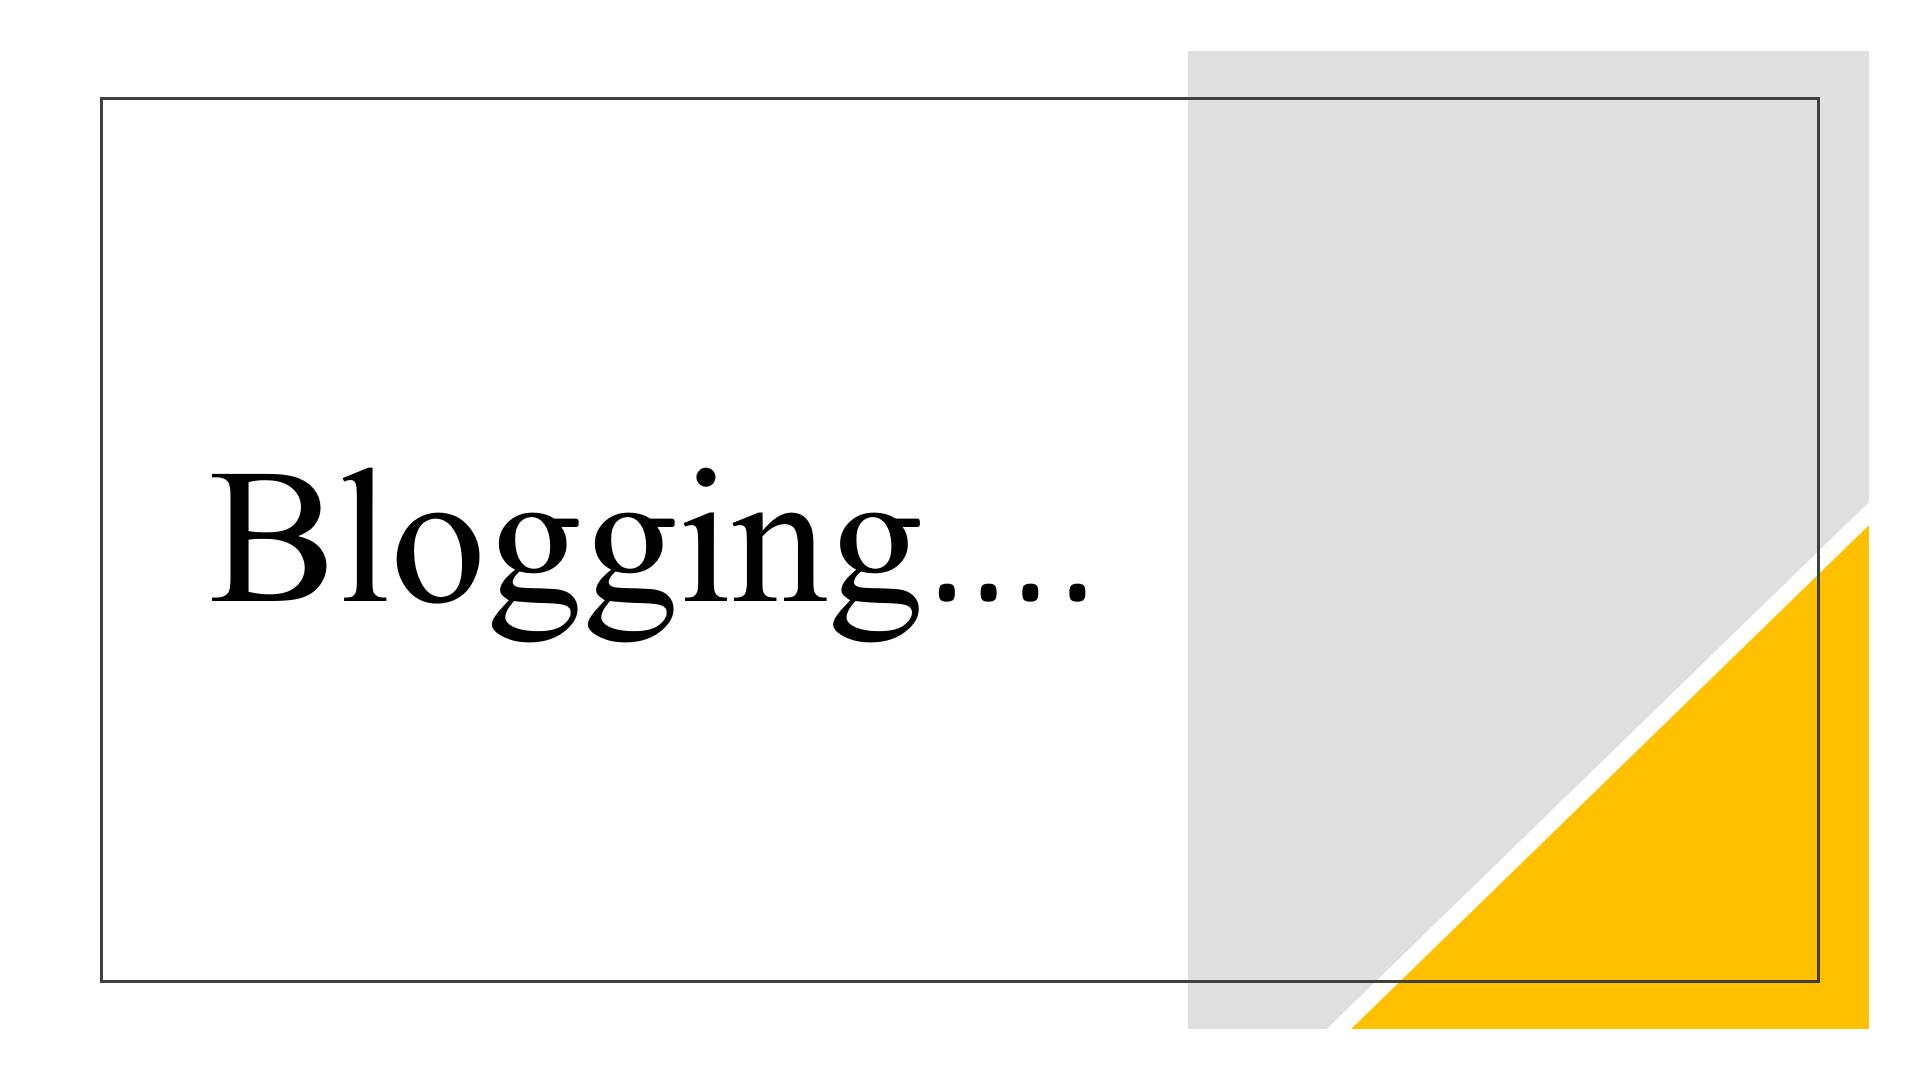 Can i make money using blogging